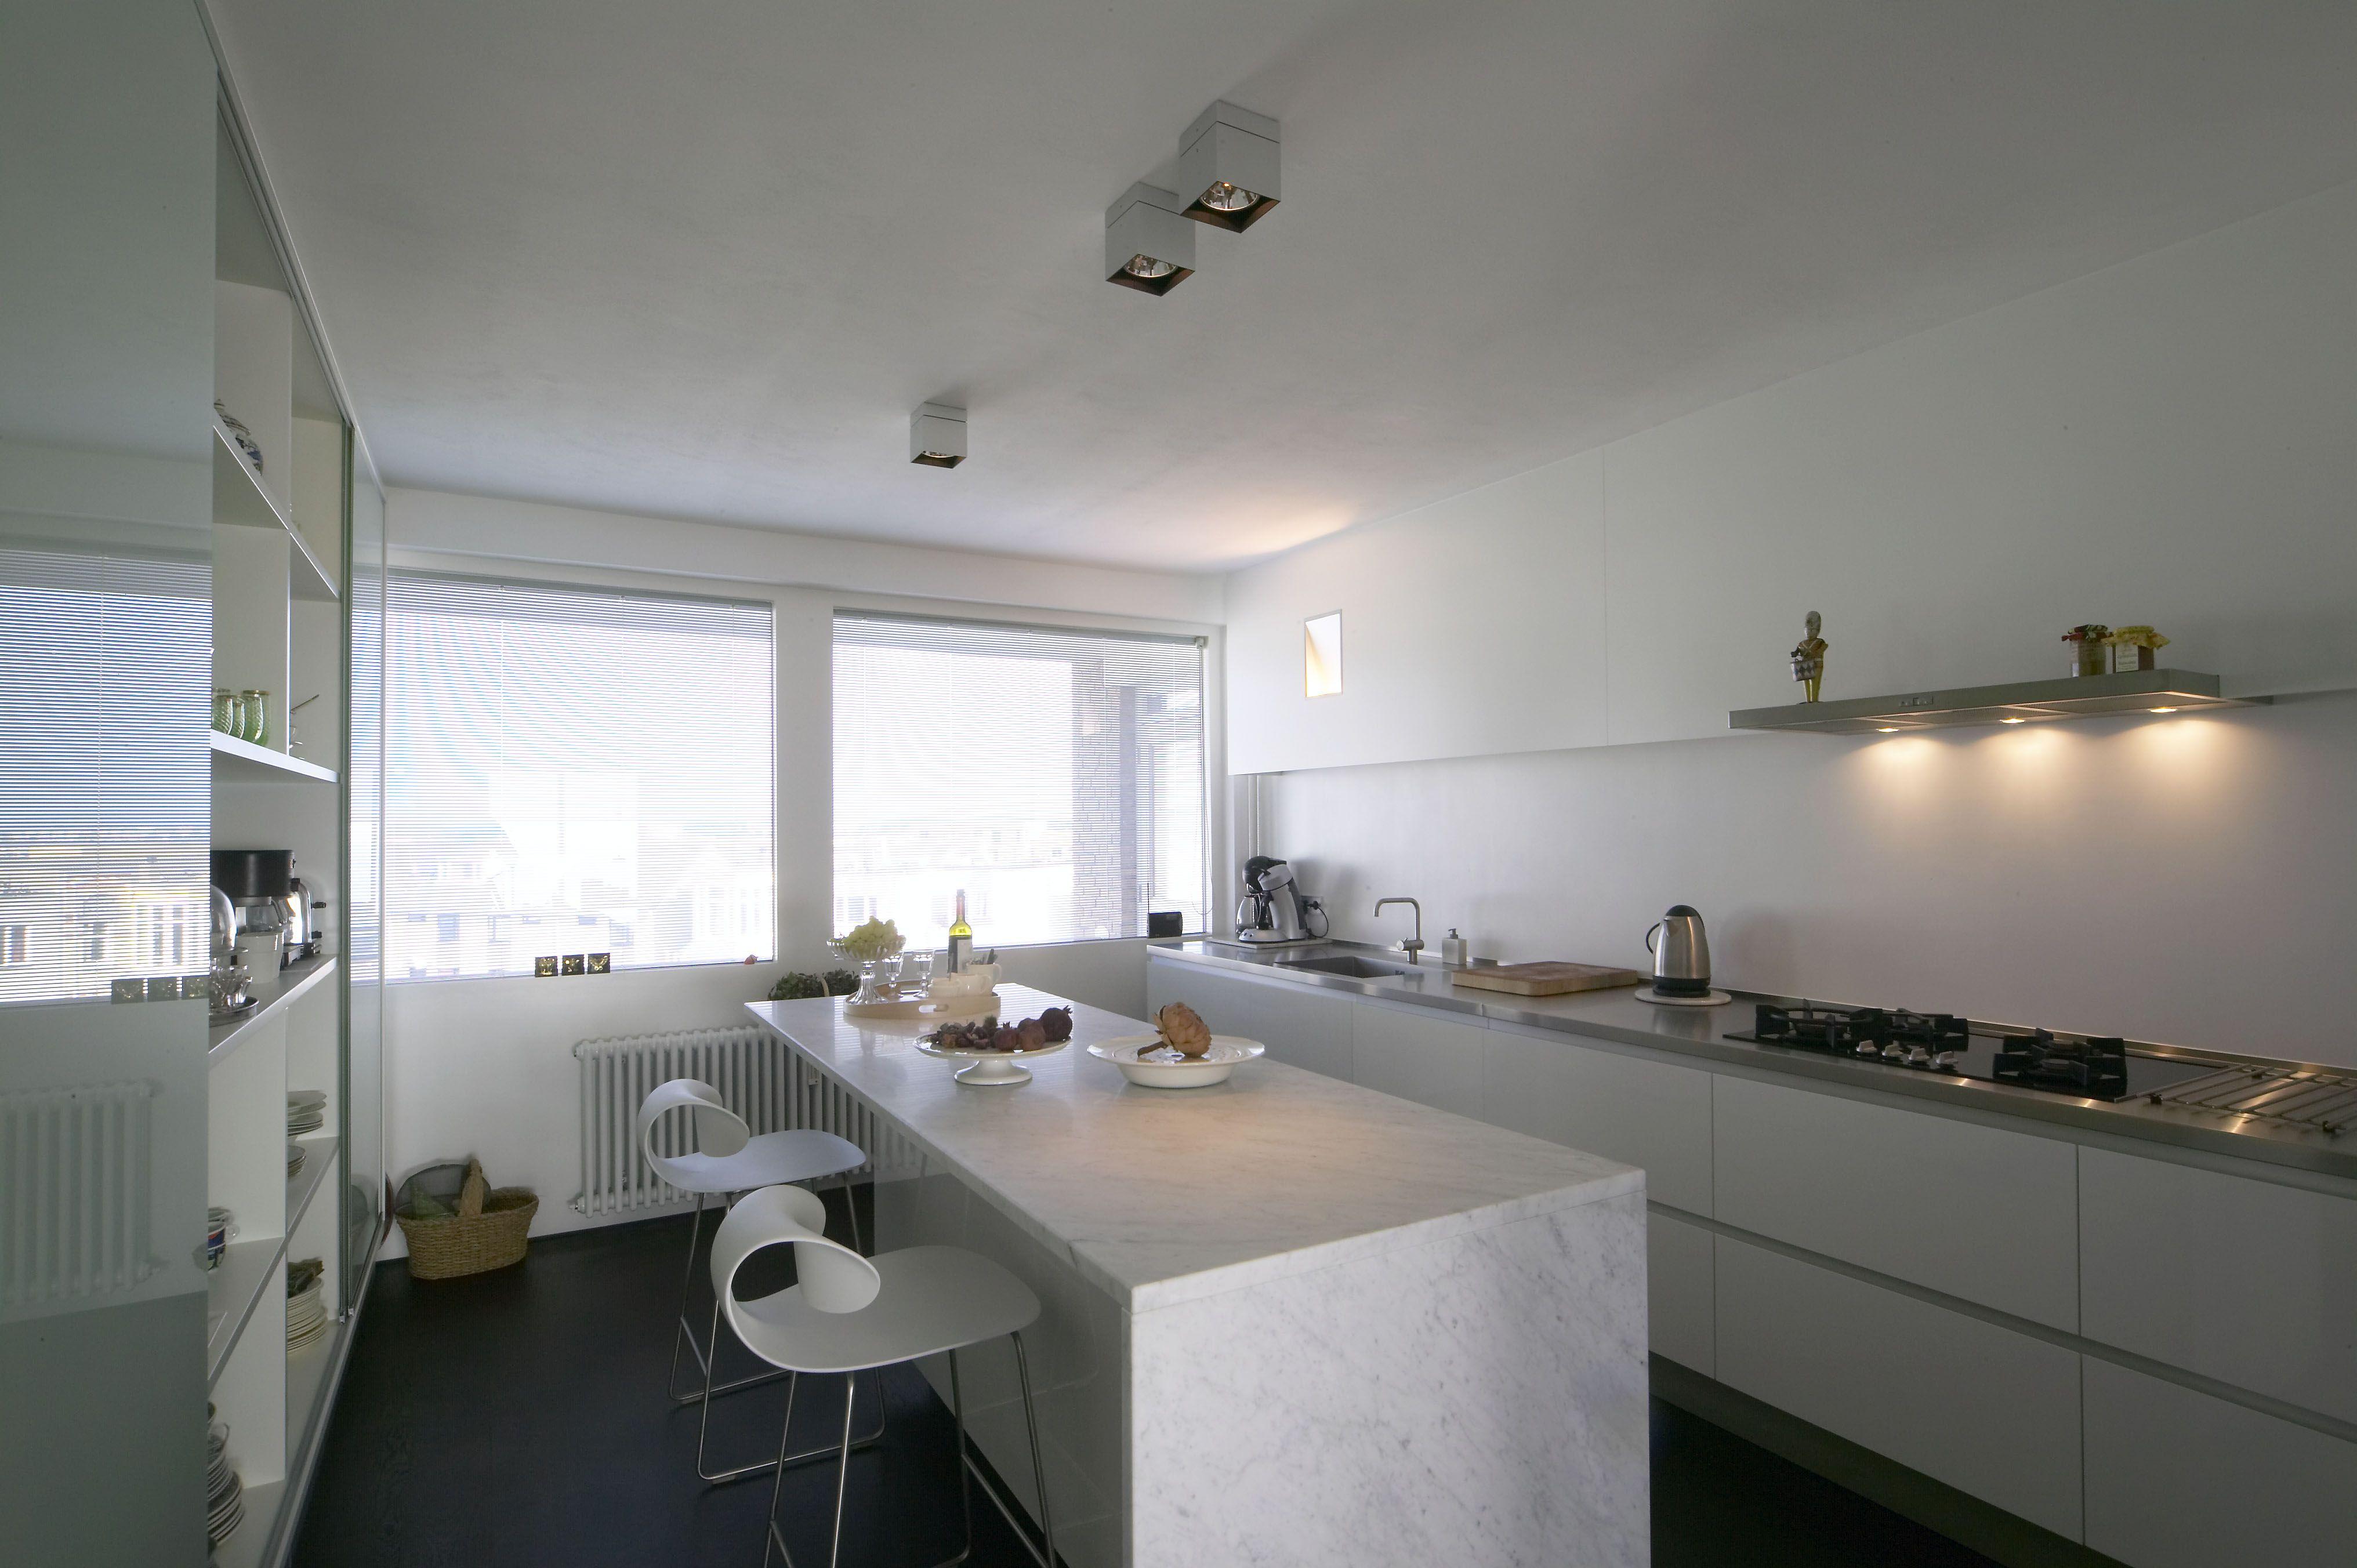 Greeploos moderne keuken hardsteen keukenblad schuifsysteem